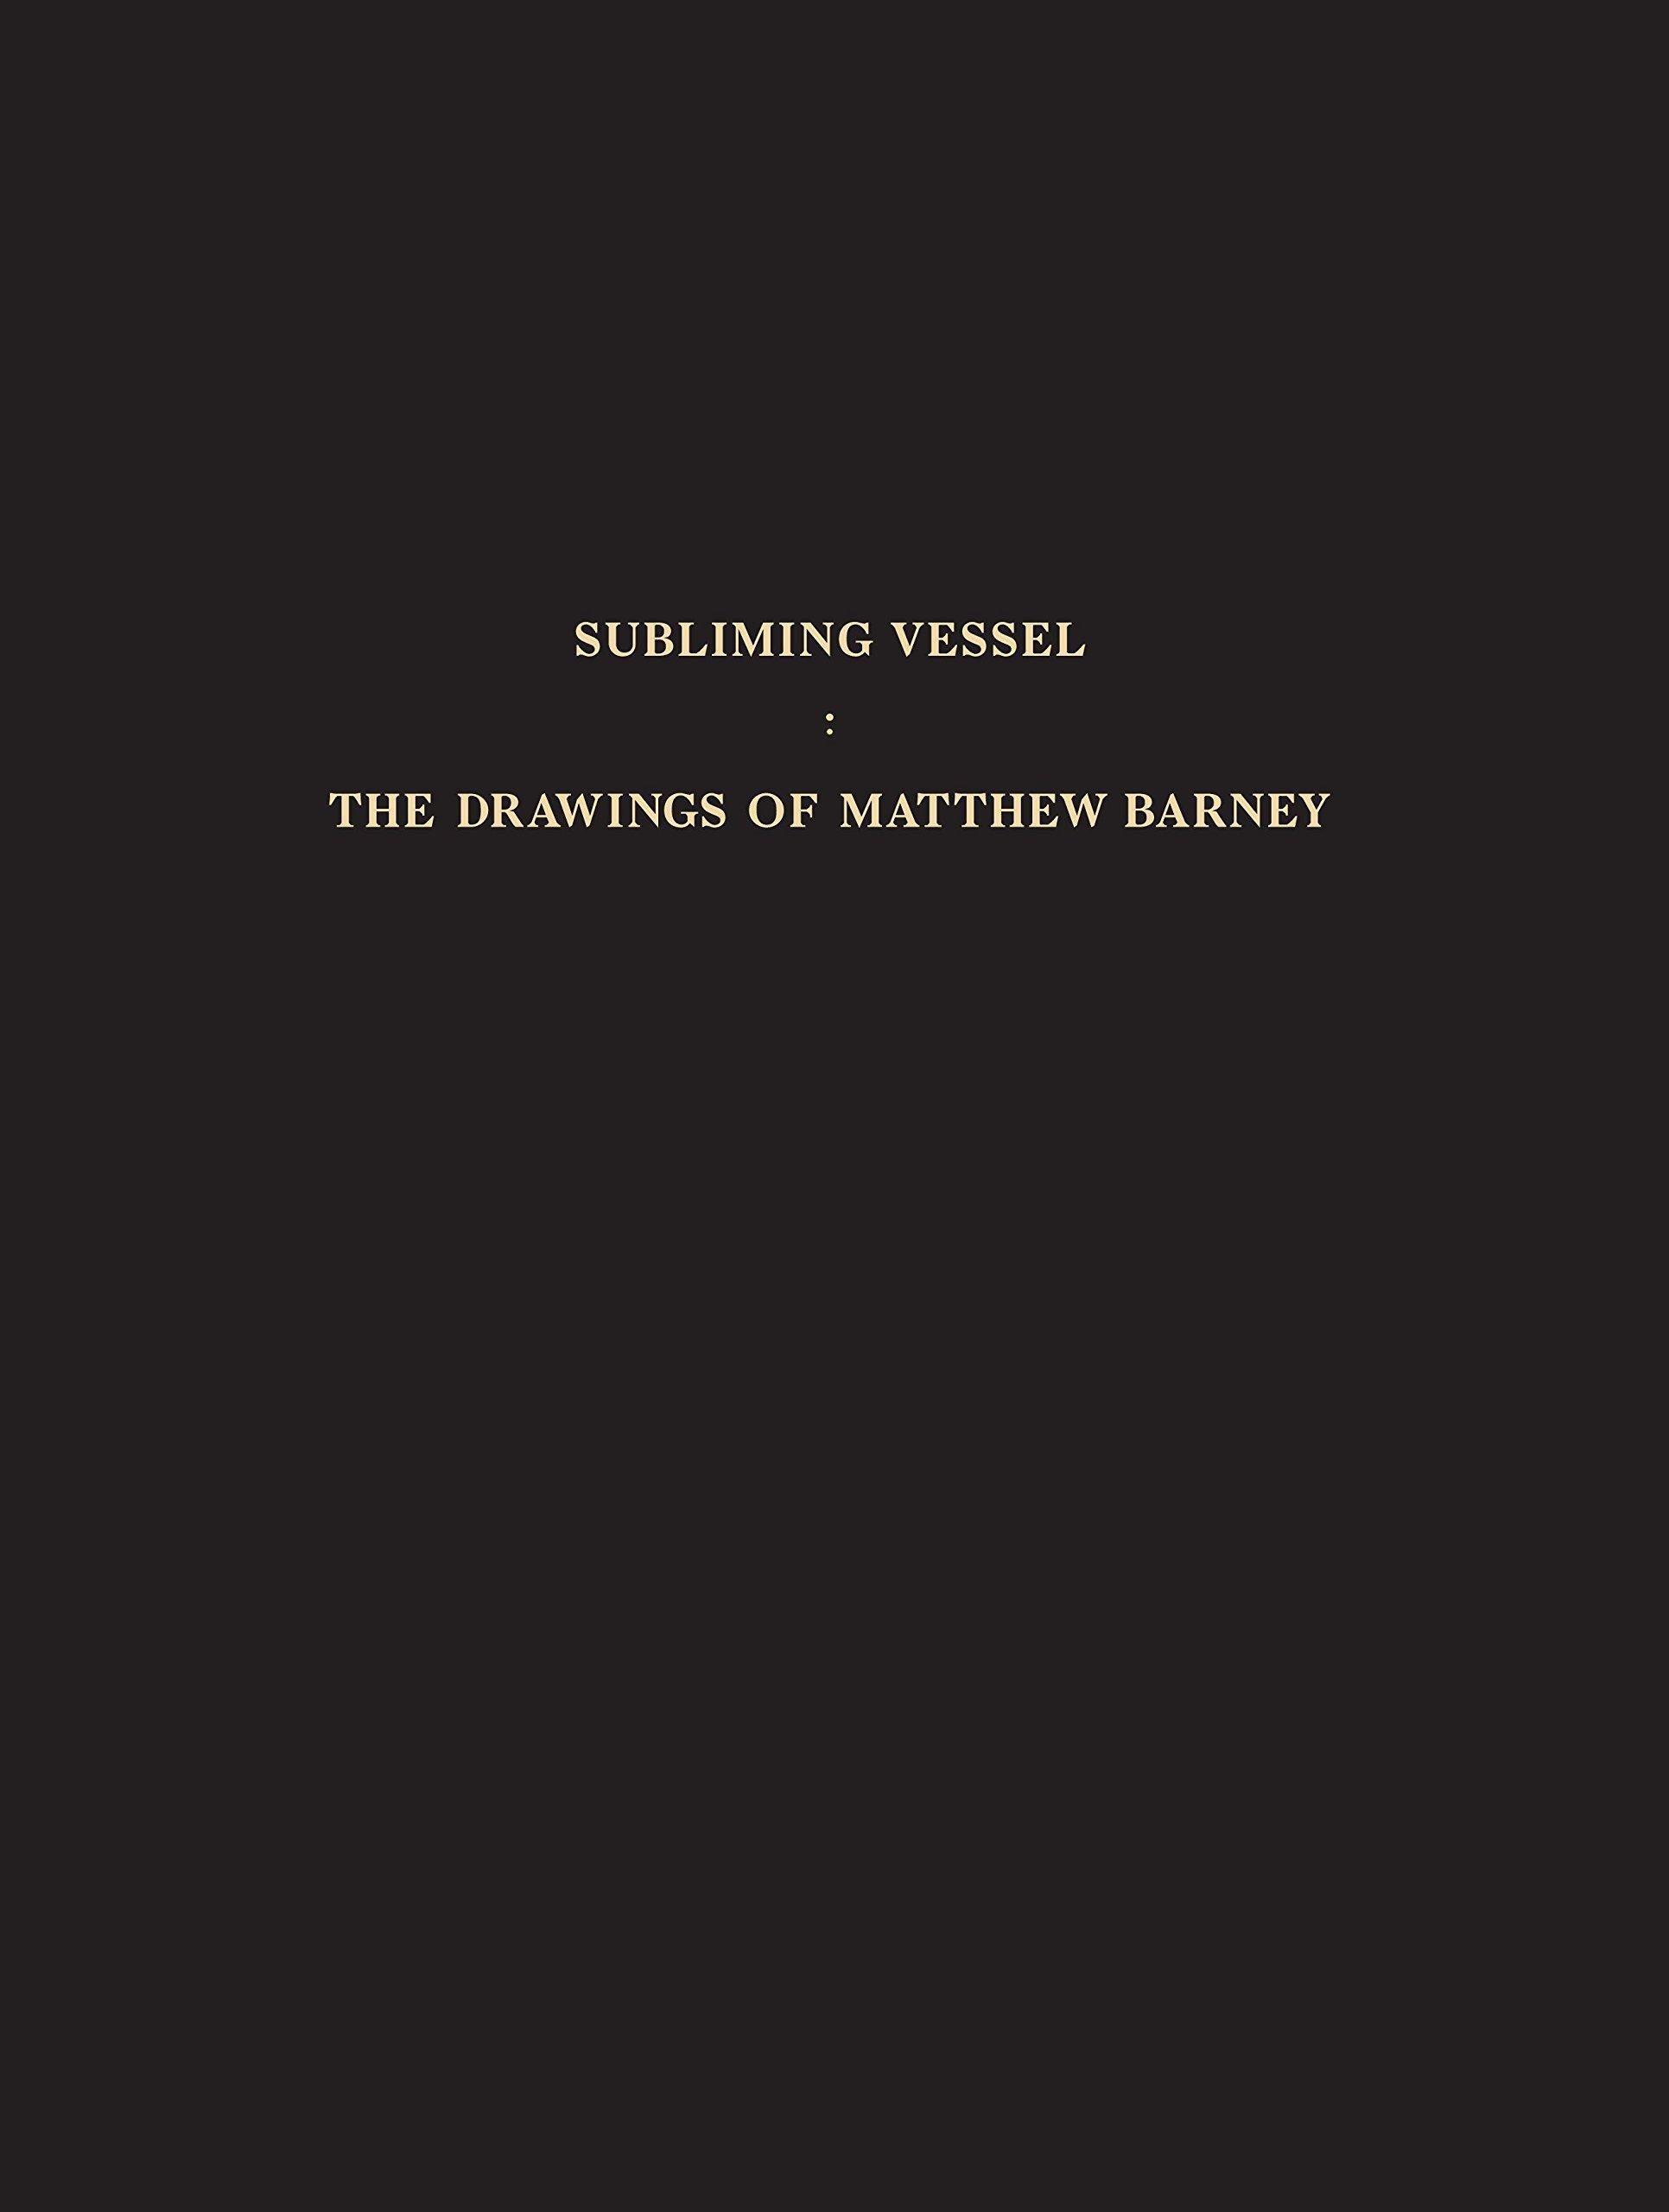 Subliming Vessel: The Drawings of Matthew Barney ebook